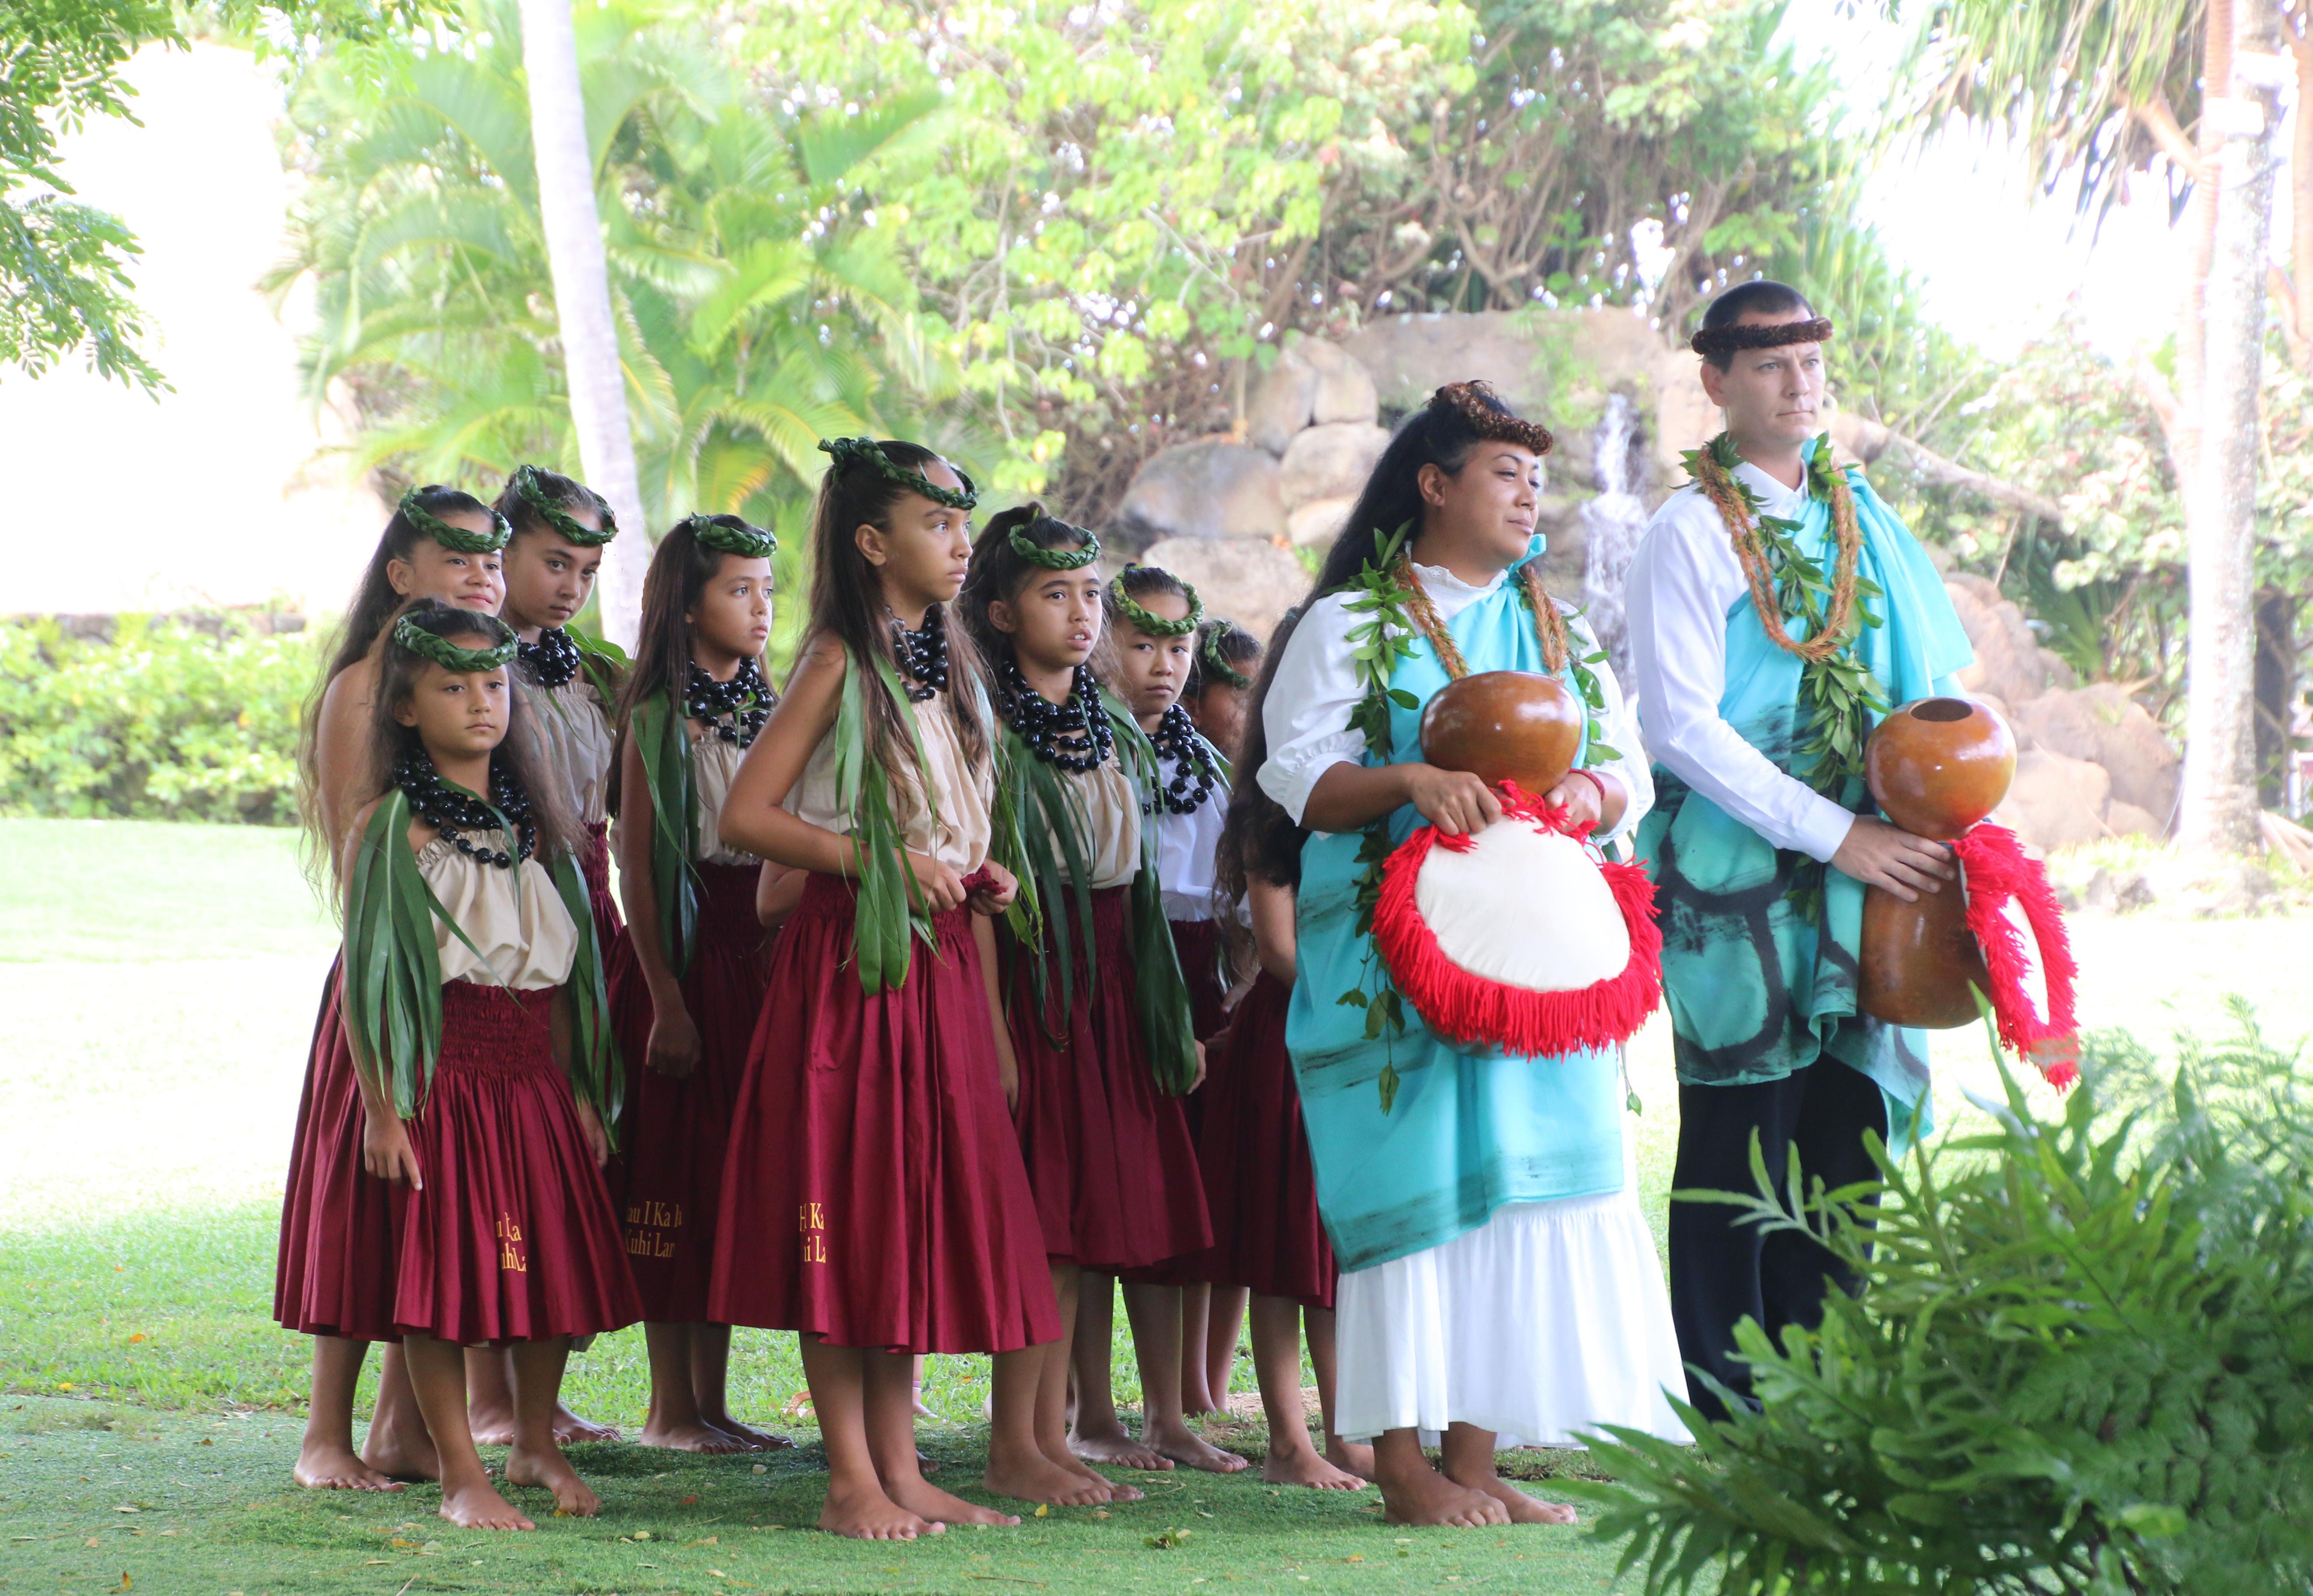 2019 Moanikeala Hula Festival – a week of celebration and learning